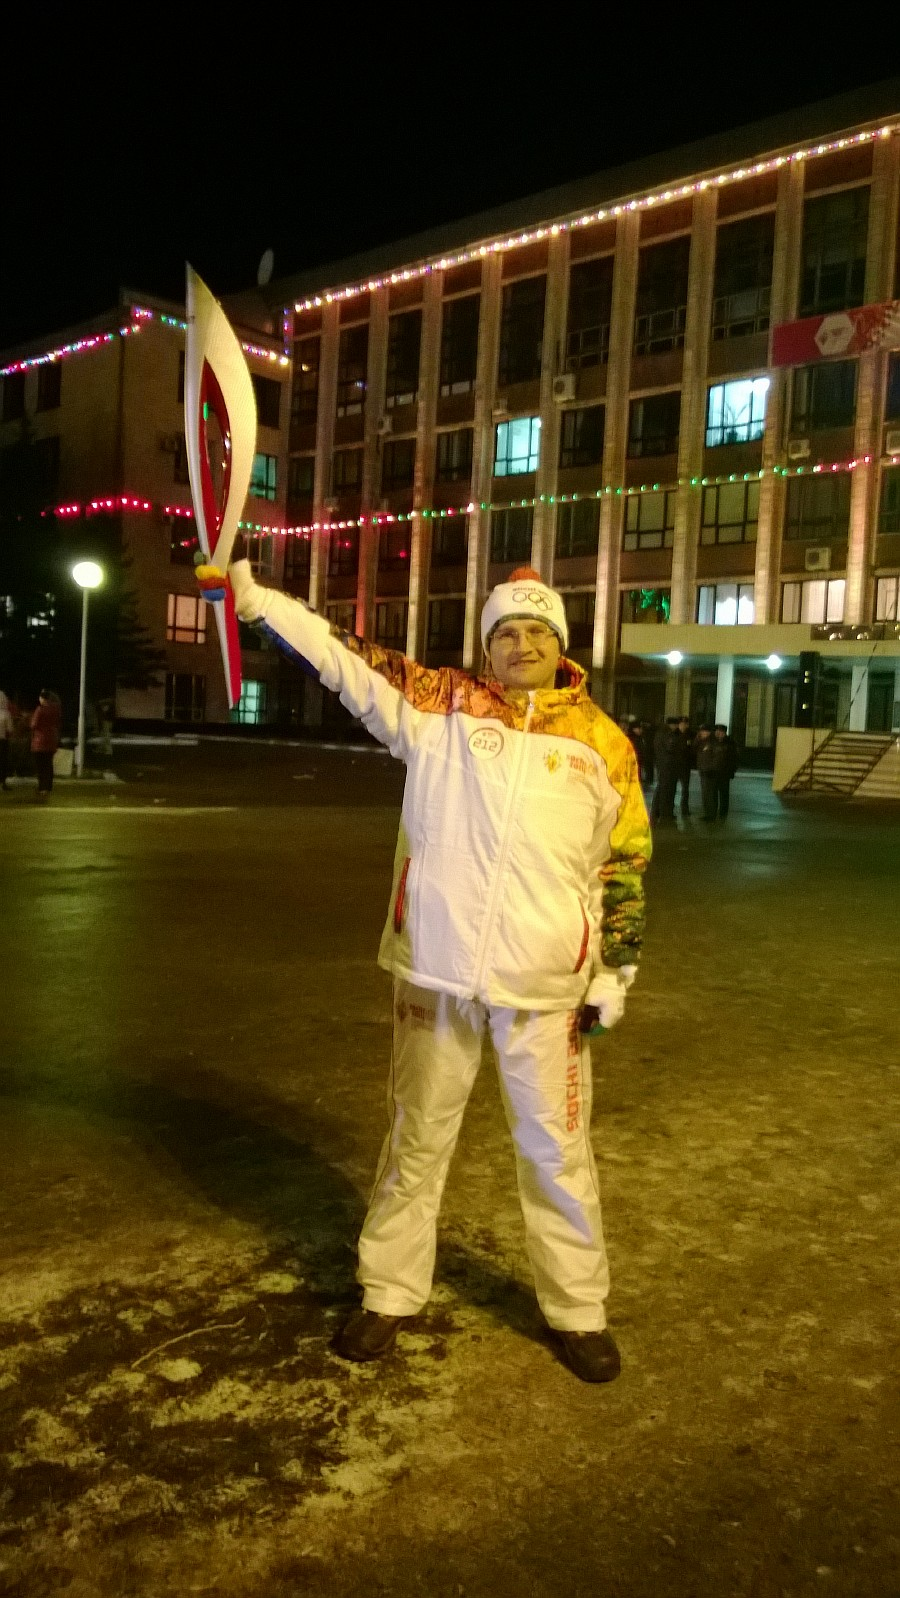 Resize of WP_20131203_048, Олимпийский огонь, Аксанов Нияз, блогеры, kukmor, путешествия, фотография, sochi2014, Сочи2014, олимпиада,  Эстафета Олимпийского огня, Барнаул, Алтайский край